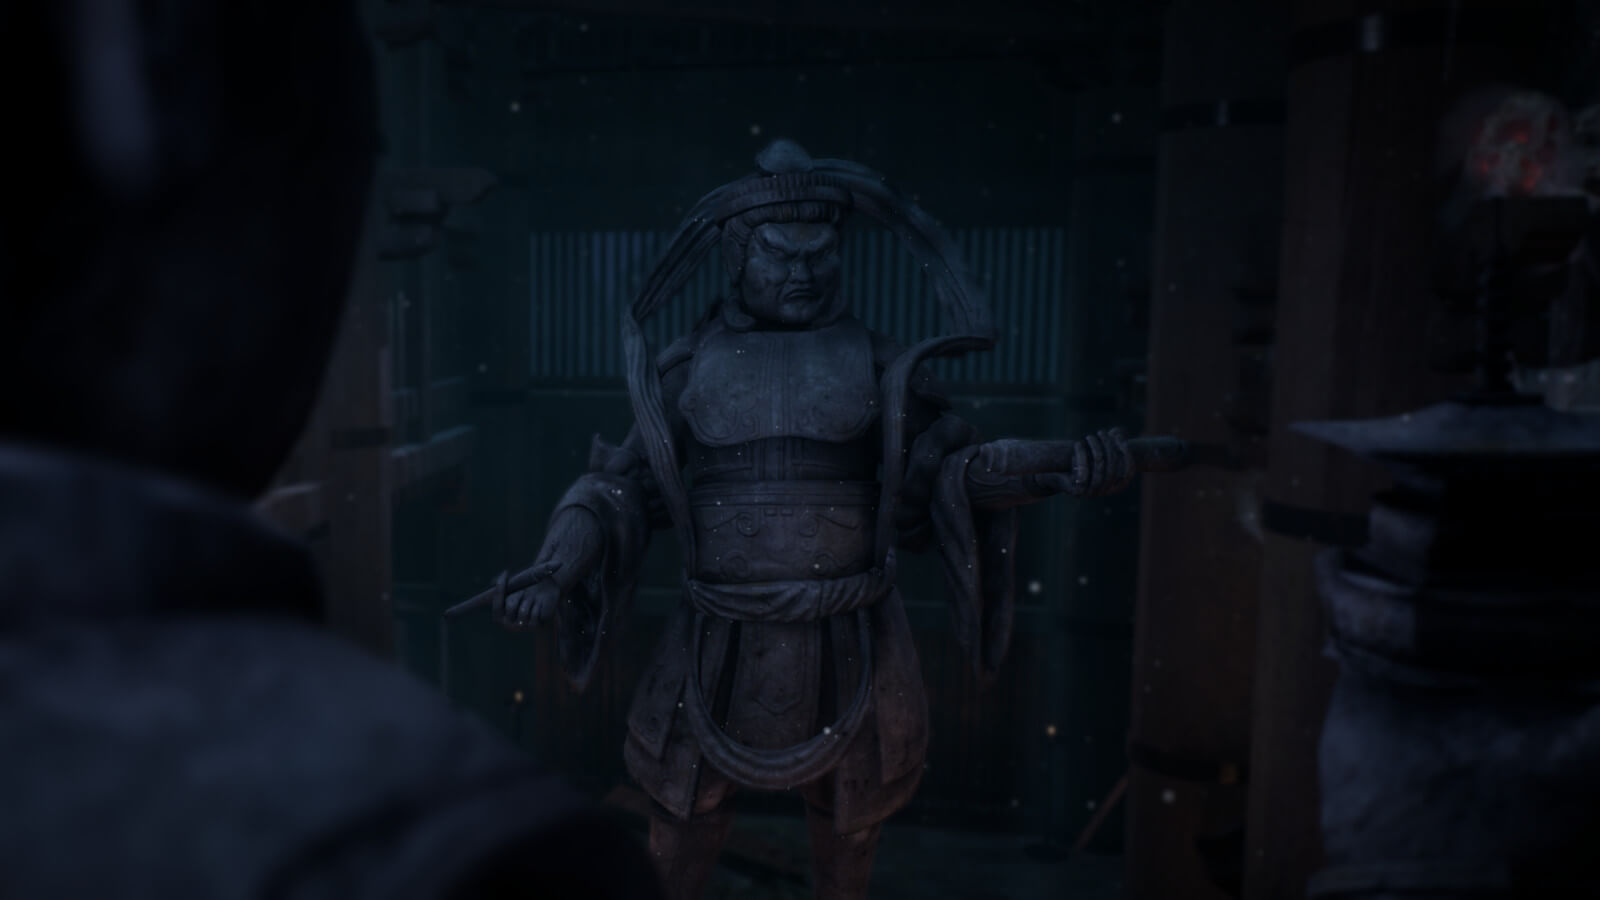 Statue in a dark room